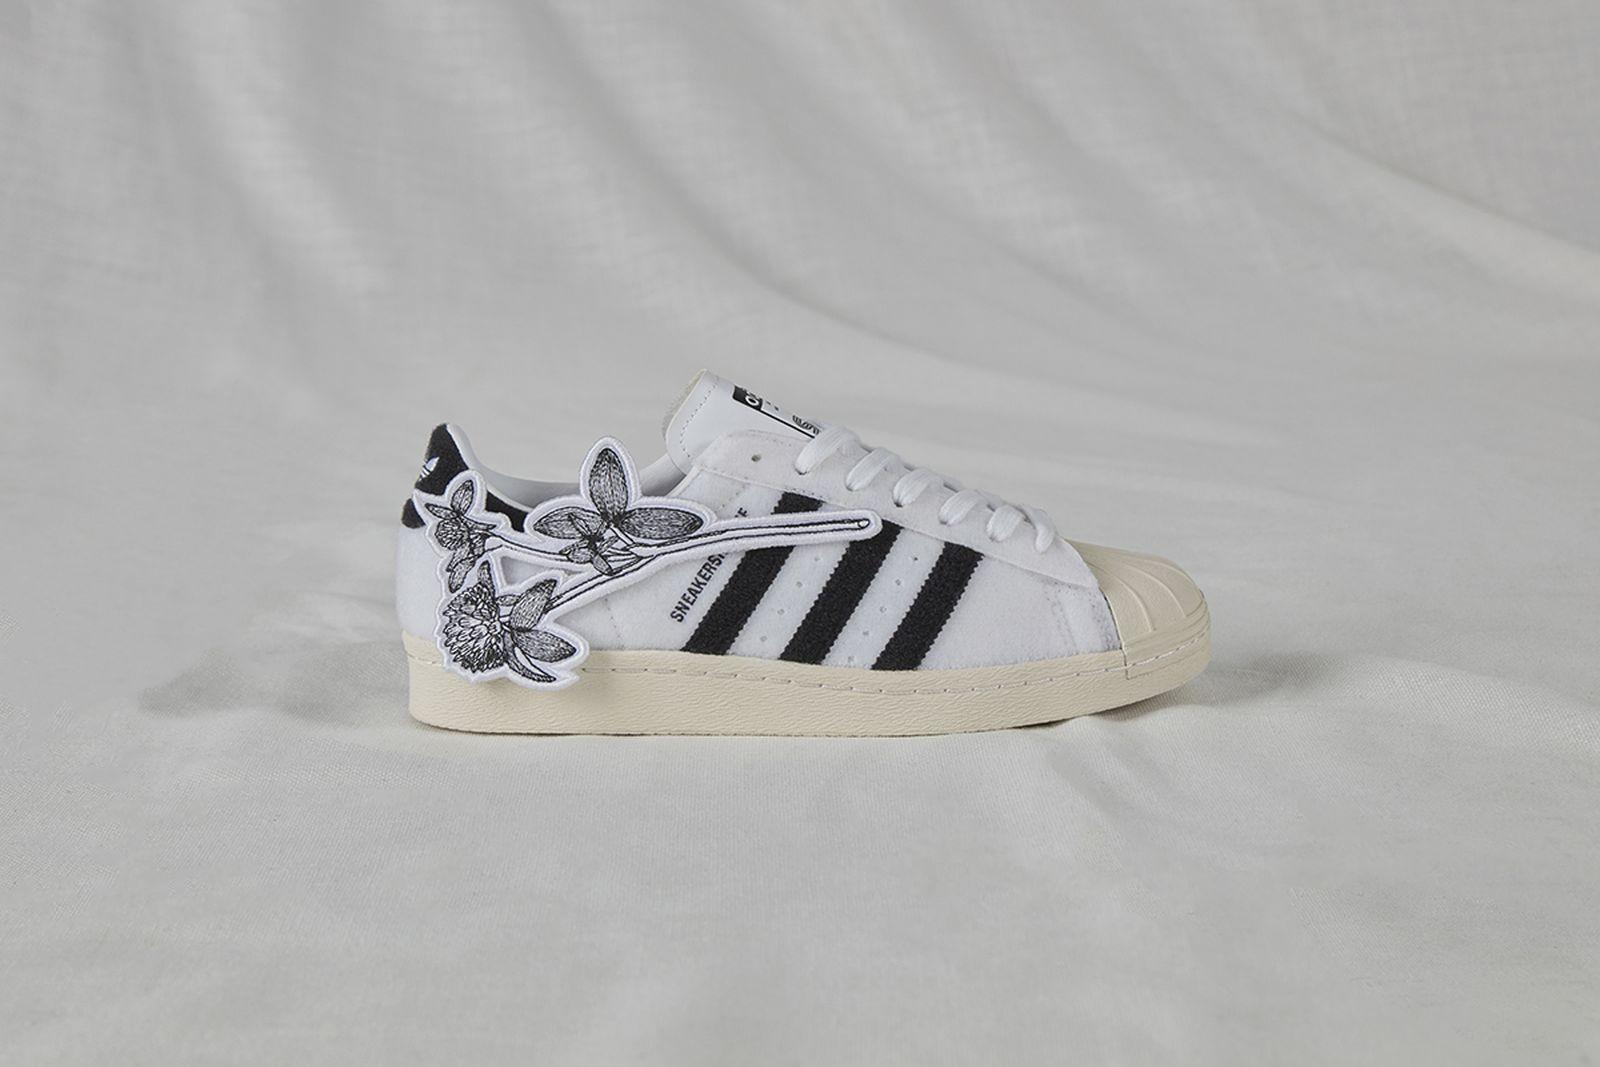 sns-kazuki-kuraishi-adidas-superstar-release-date-price-07